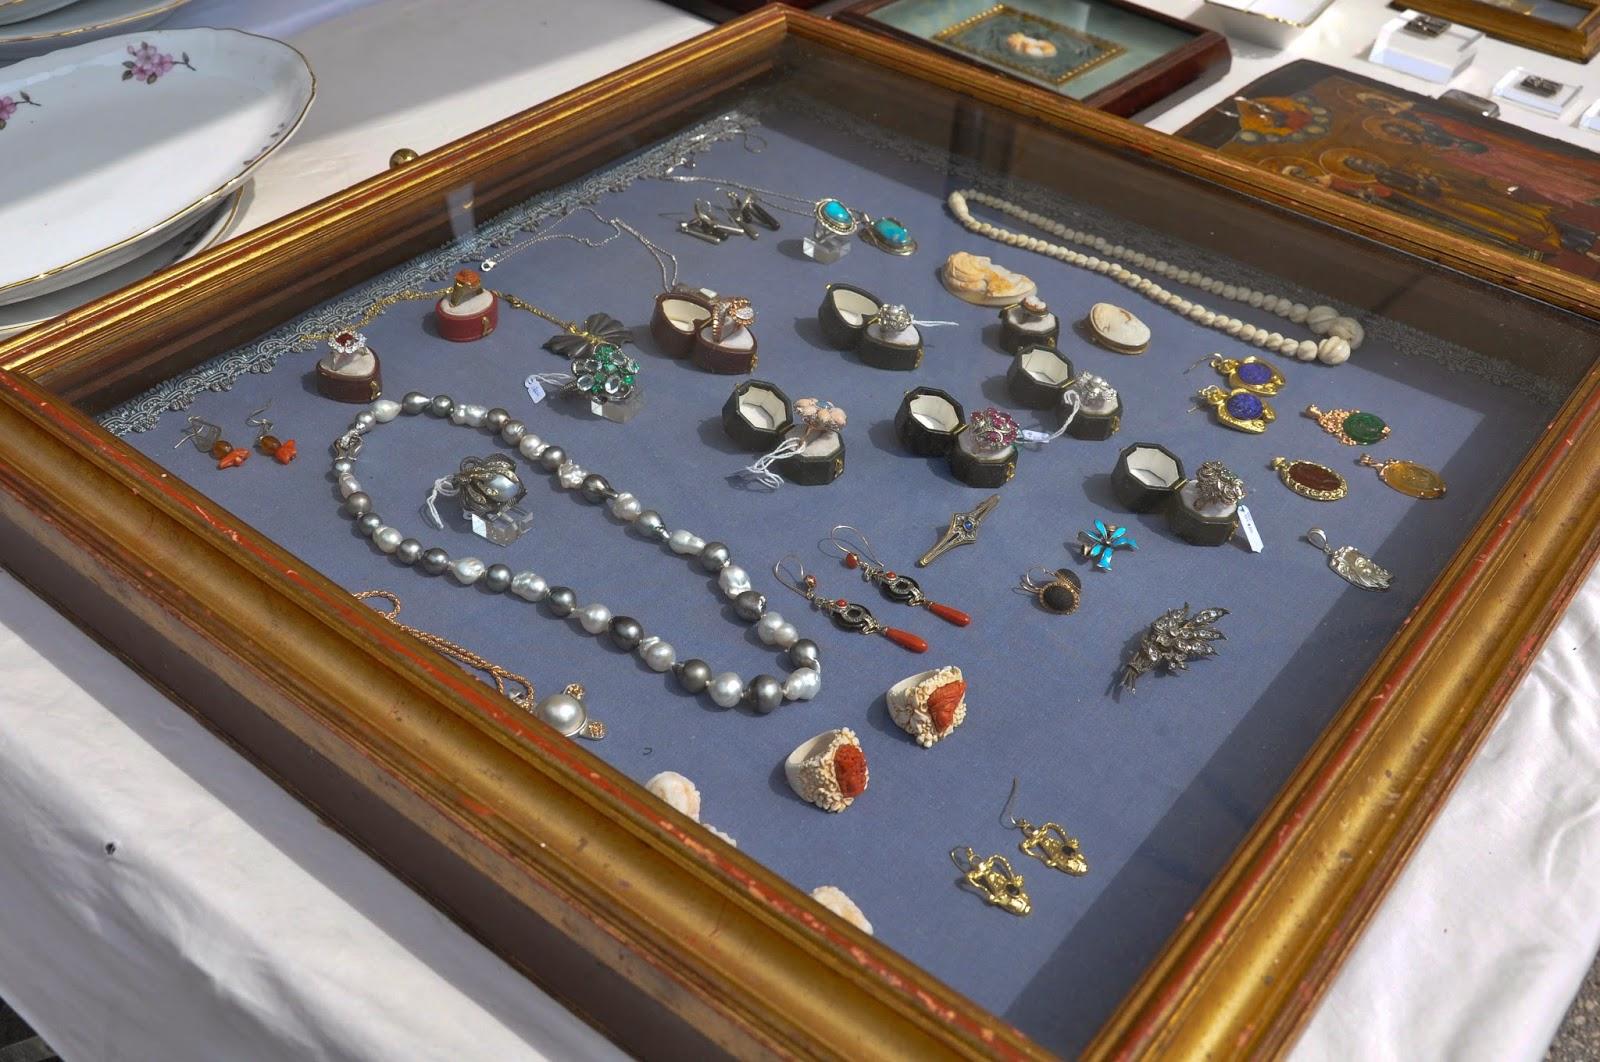 Jewellery, Antiques market, Piazzola sul Brenta, Veneto, Italy